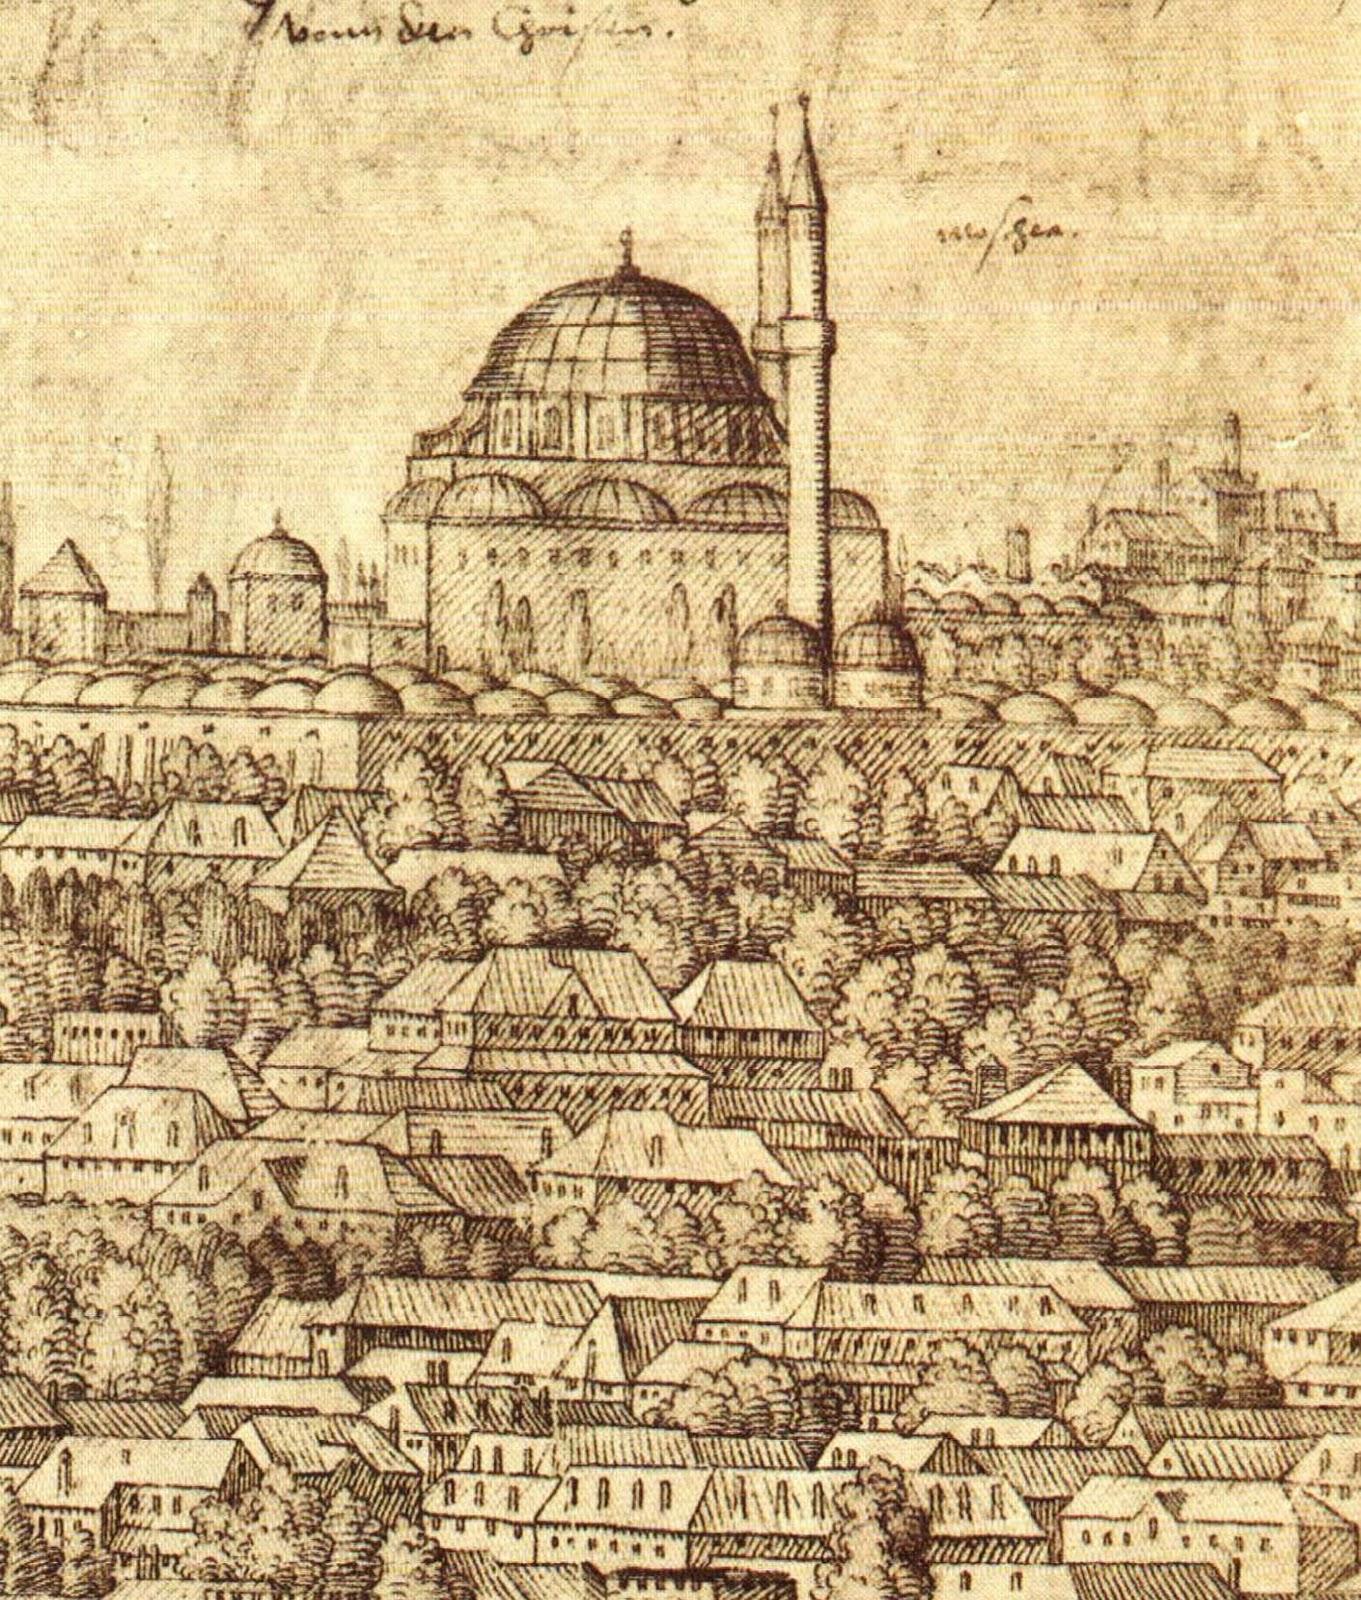 Istanbului desenat de Melchior Lorck - sursa http://t24.com.tr/haber/kanuni-doneminde-bir-seyyah-ressam-melchior-lorck,125296